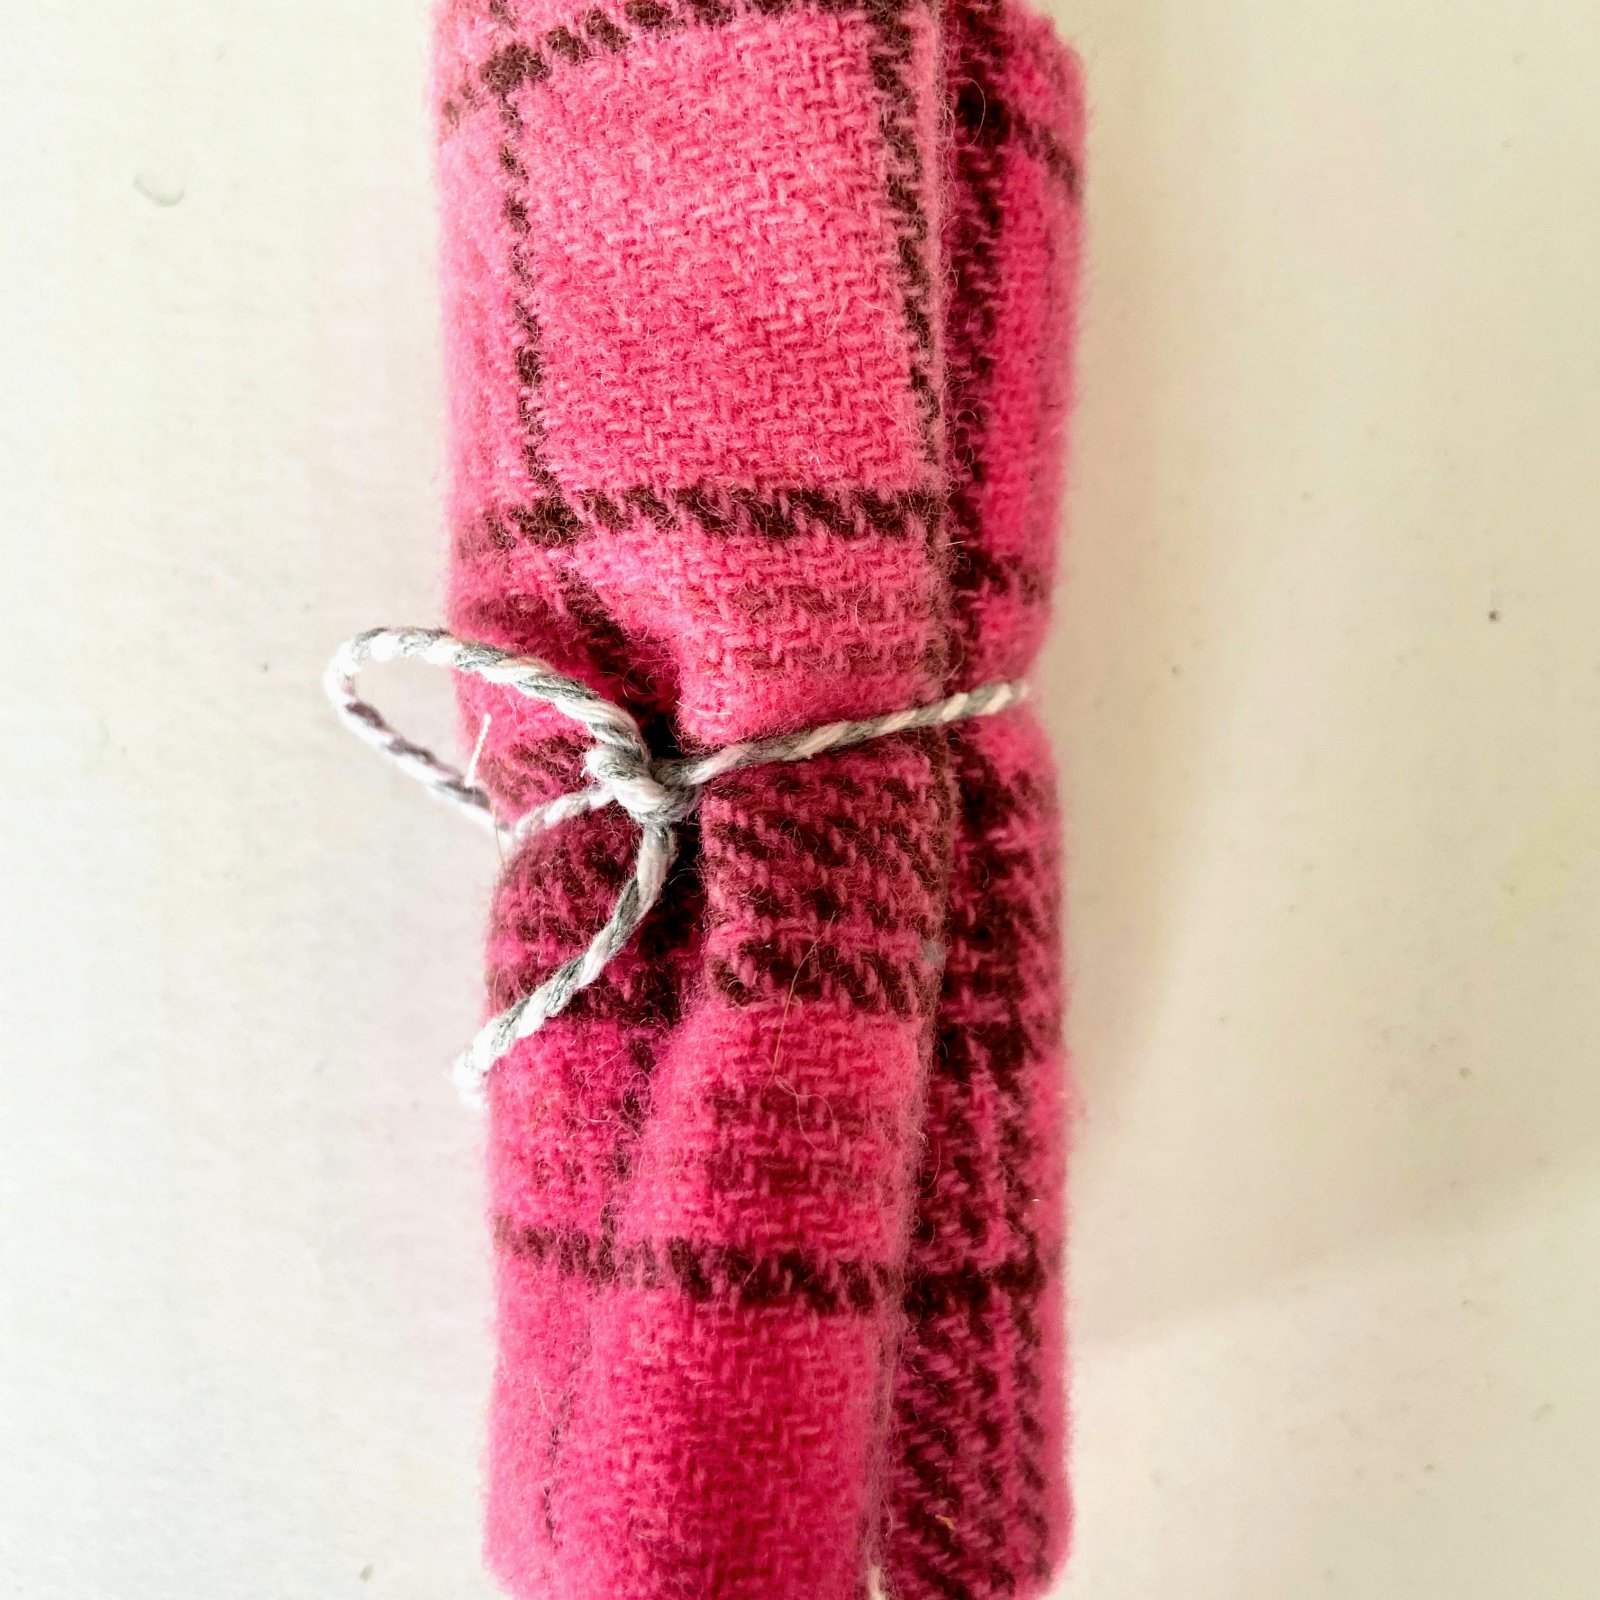 Wool 8 x 12 - Pink Plaid